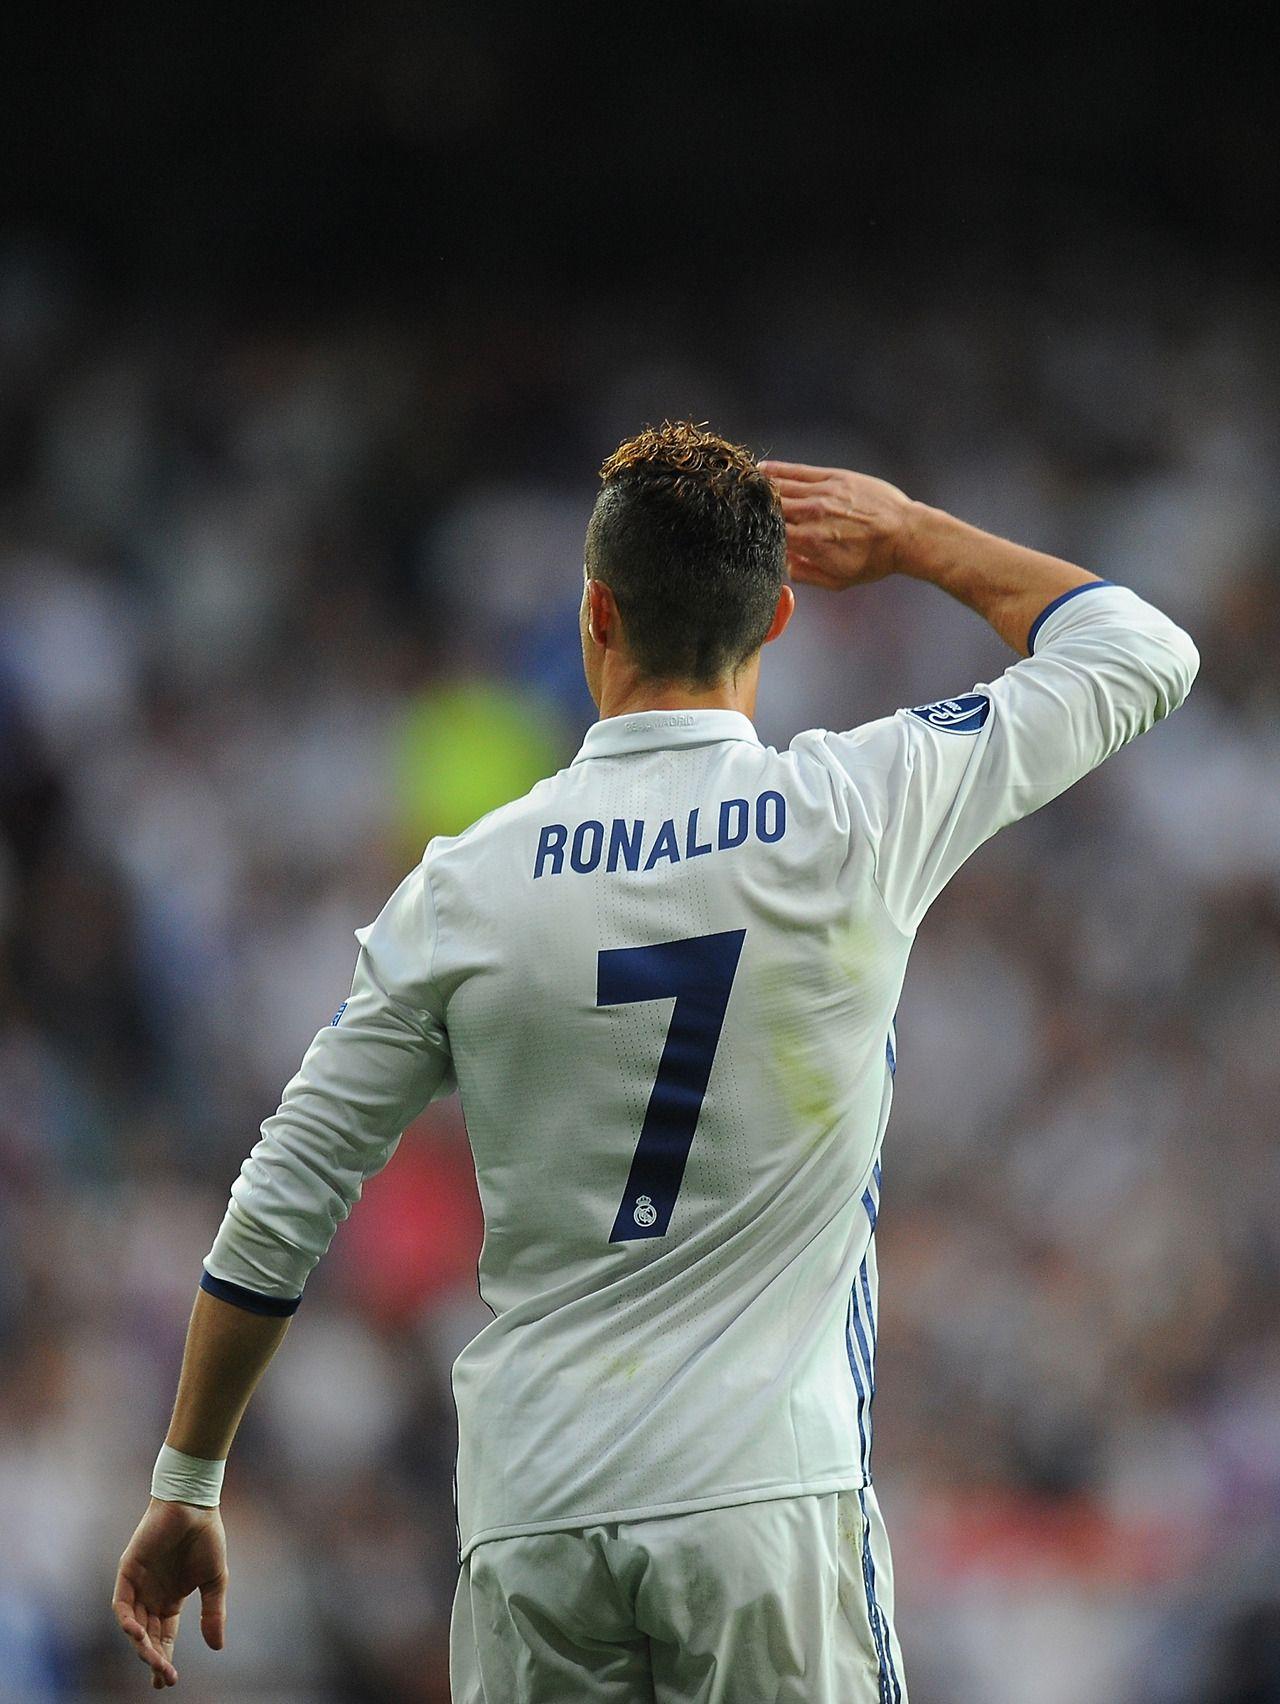 Cristiano Ronaldo Number